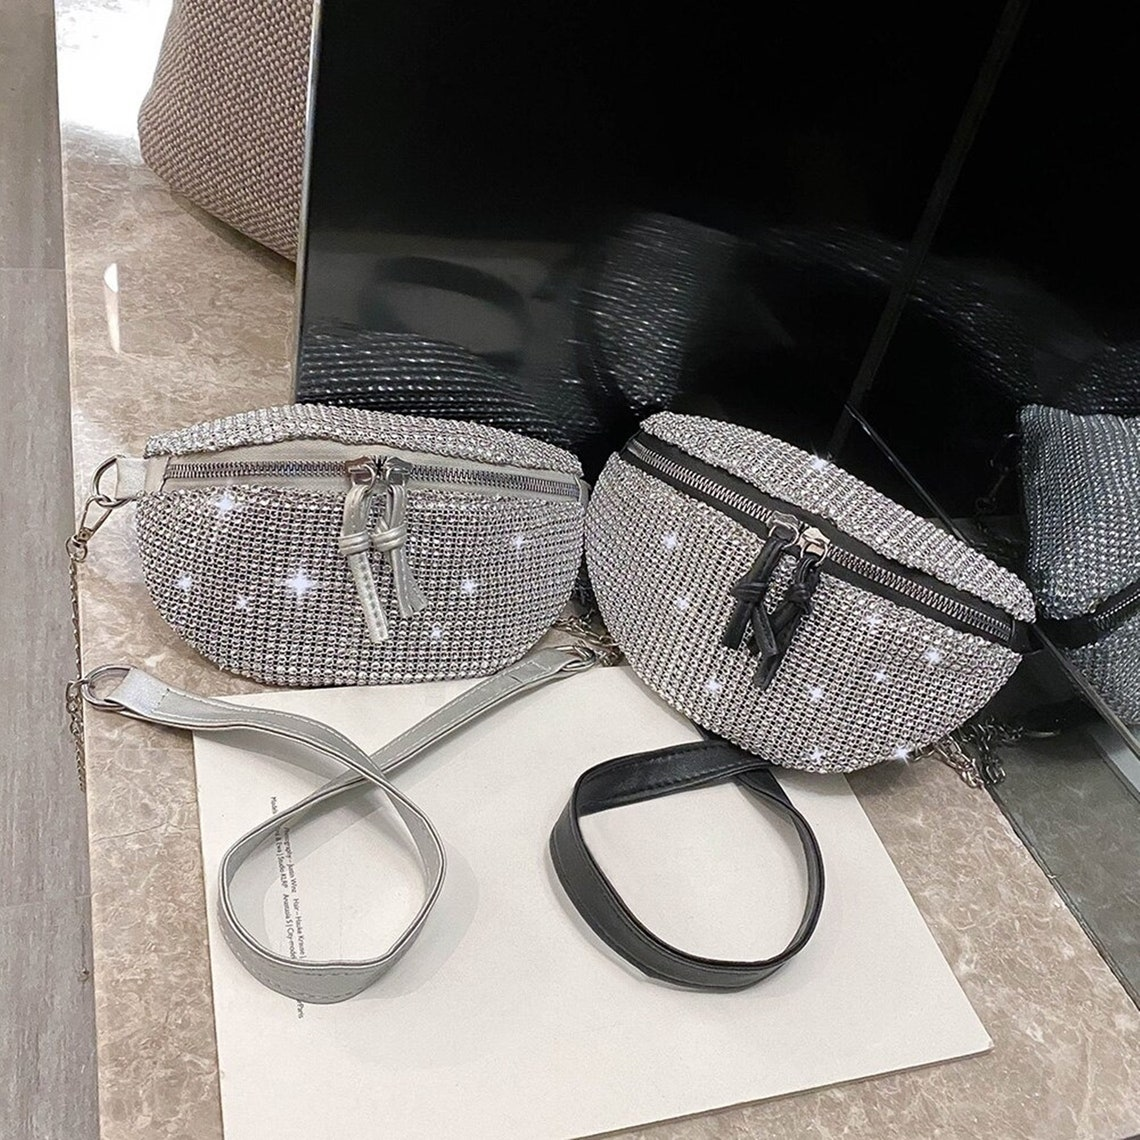 Handbag Express - Handbags - Rhinestone Bling - Petite